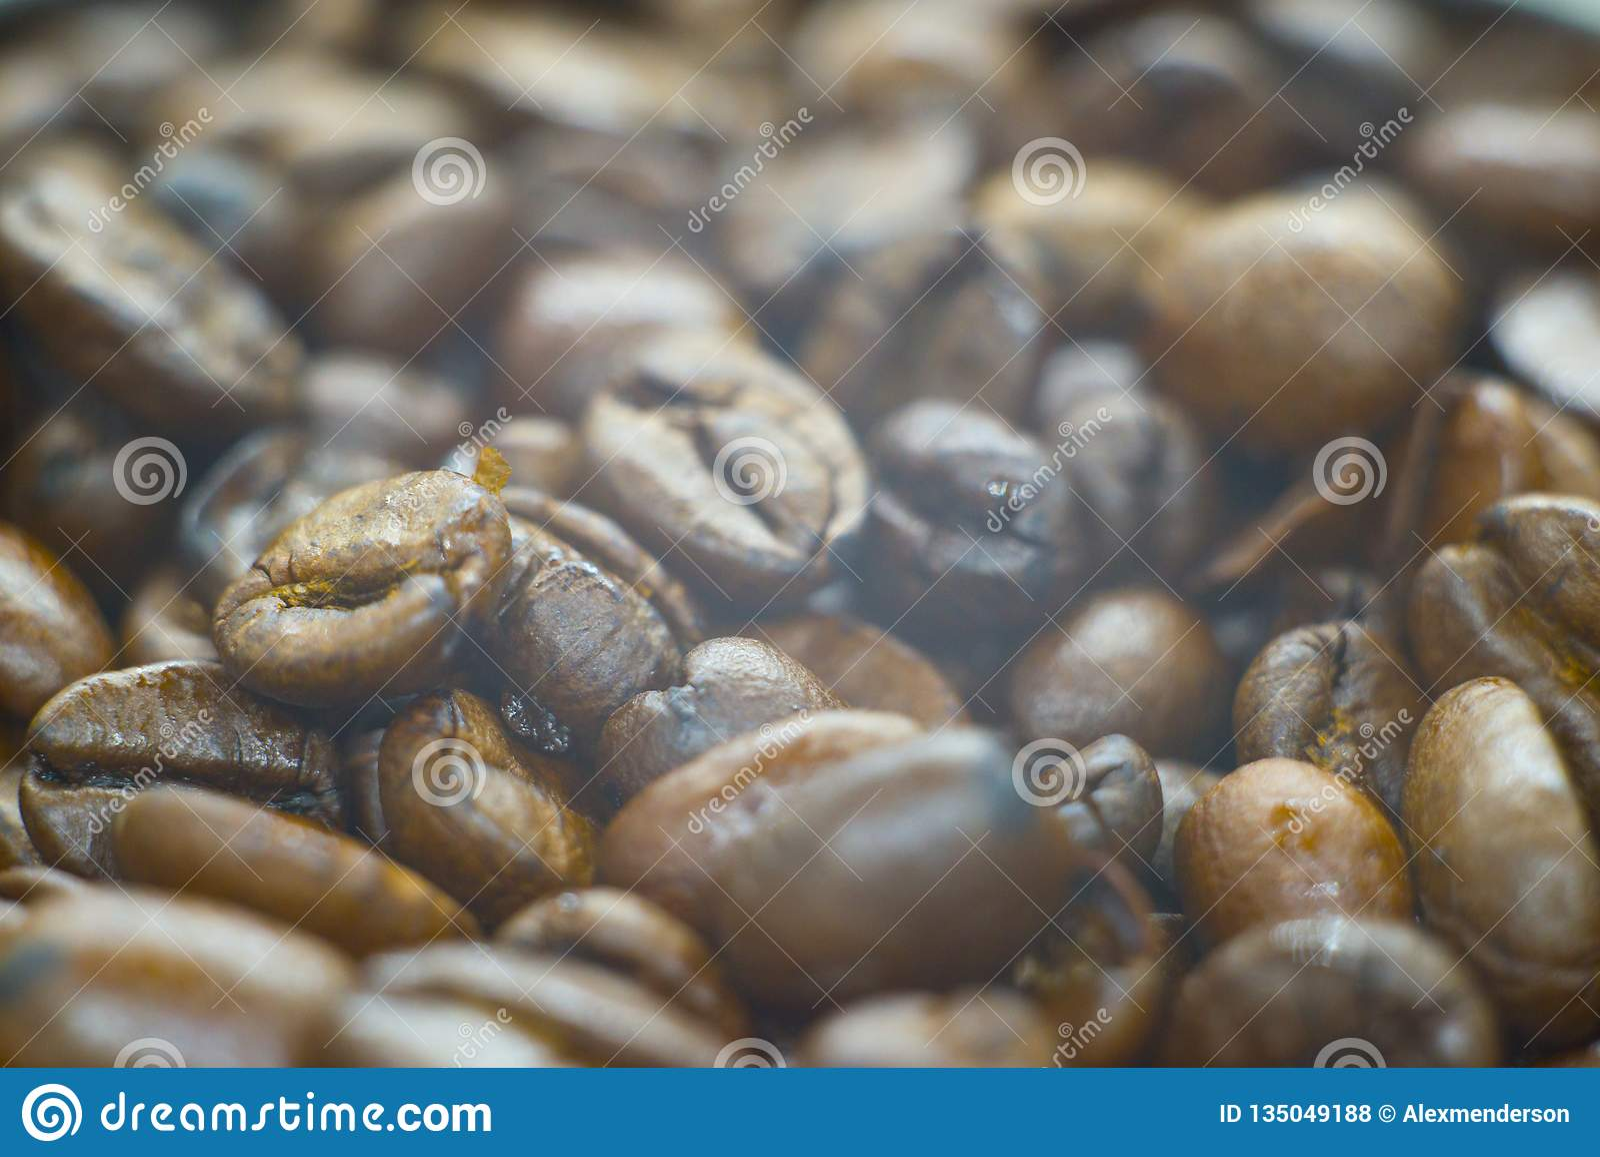 Photo of a fresh coffee beans